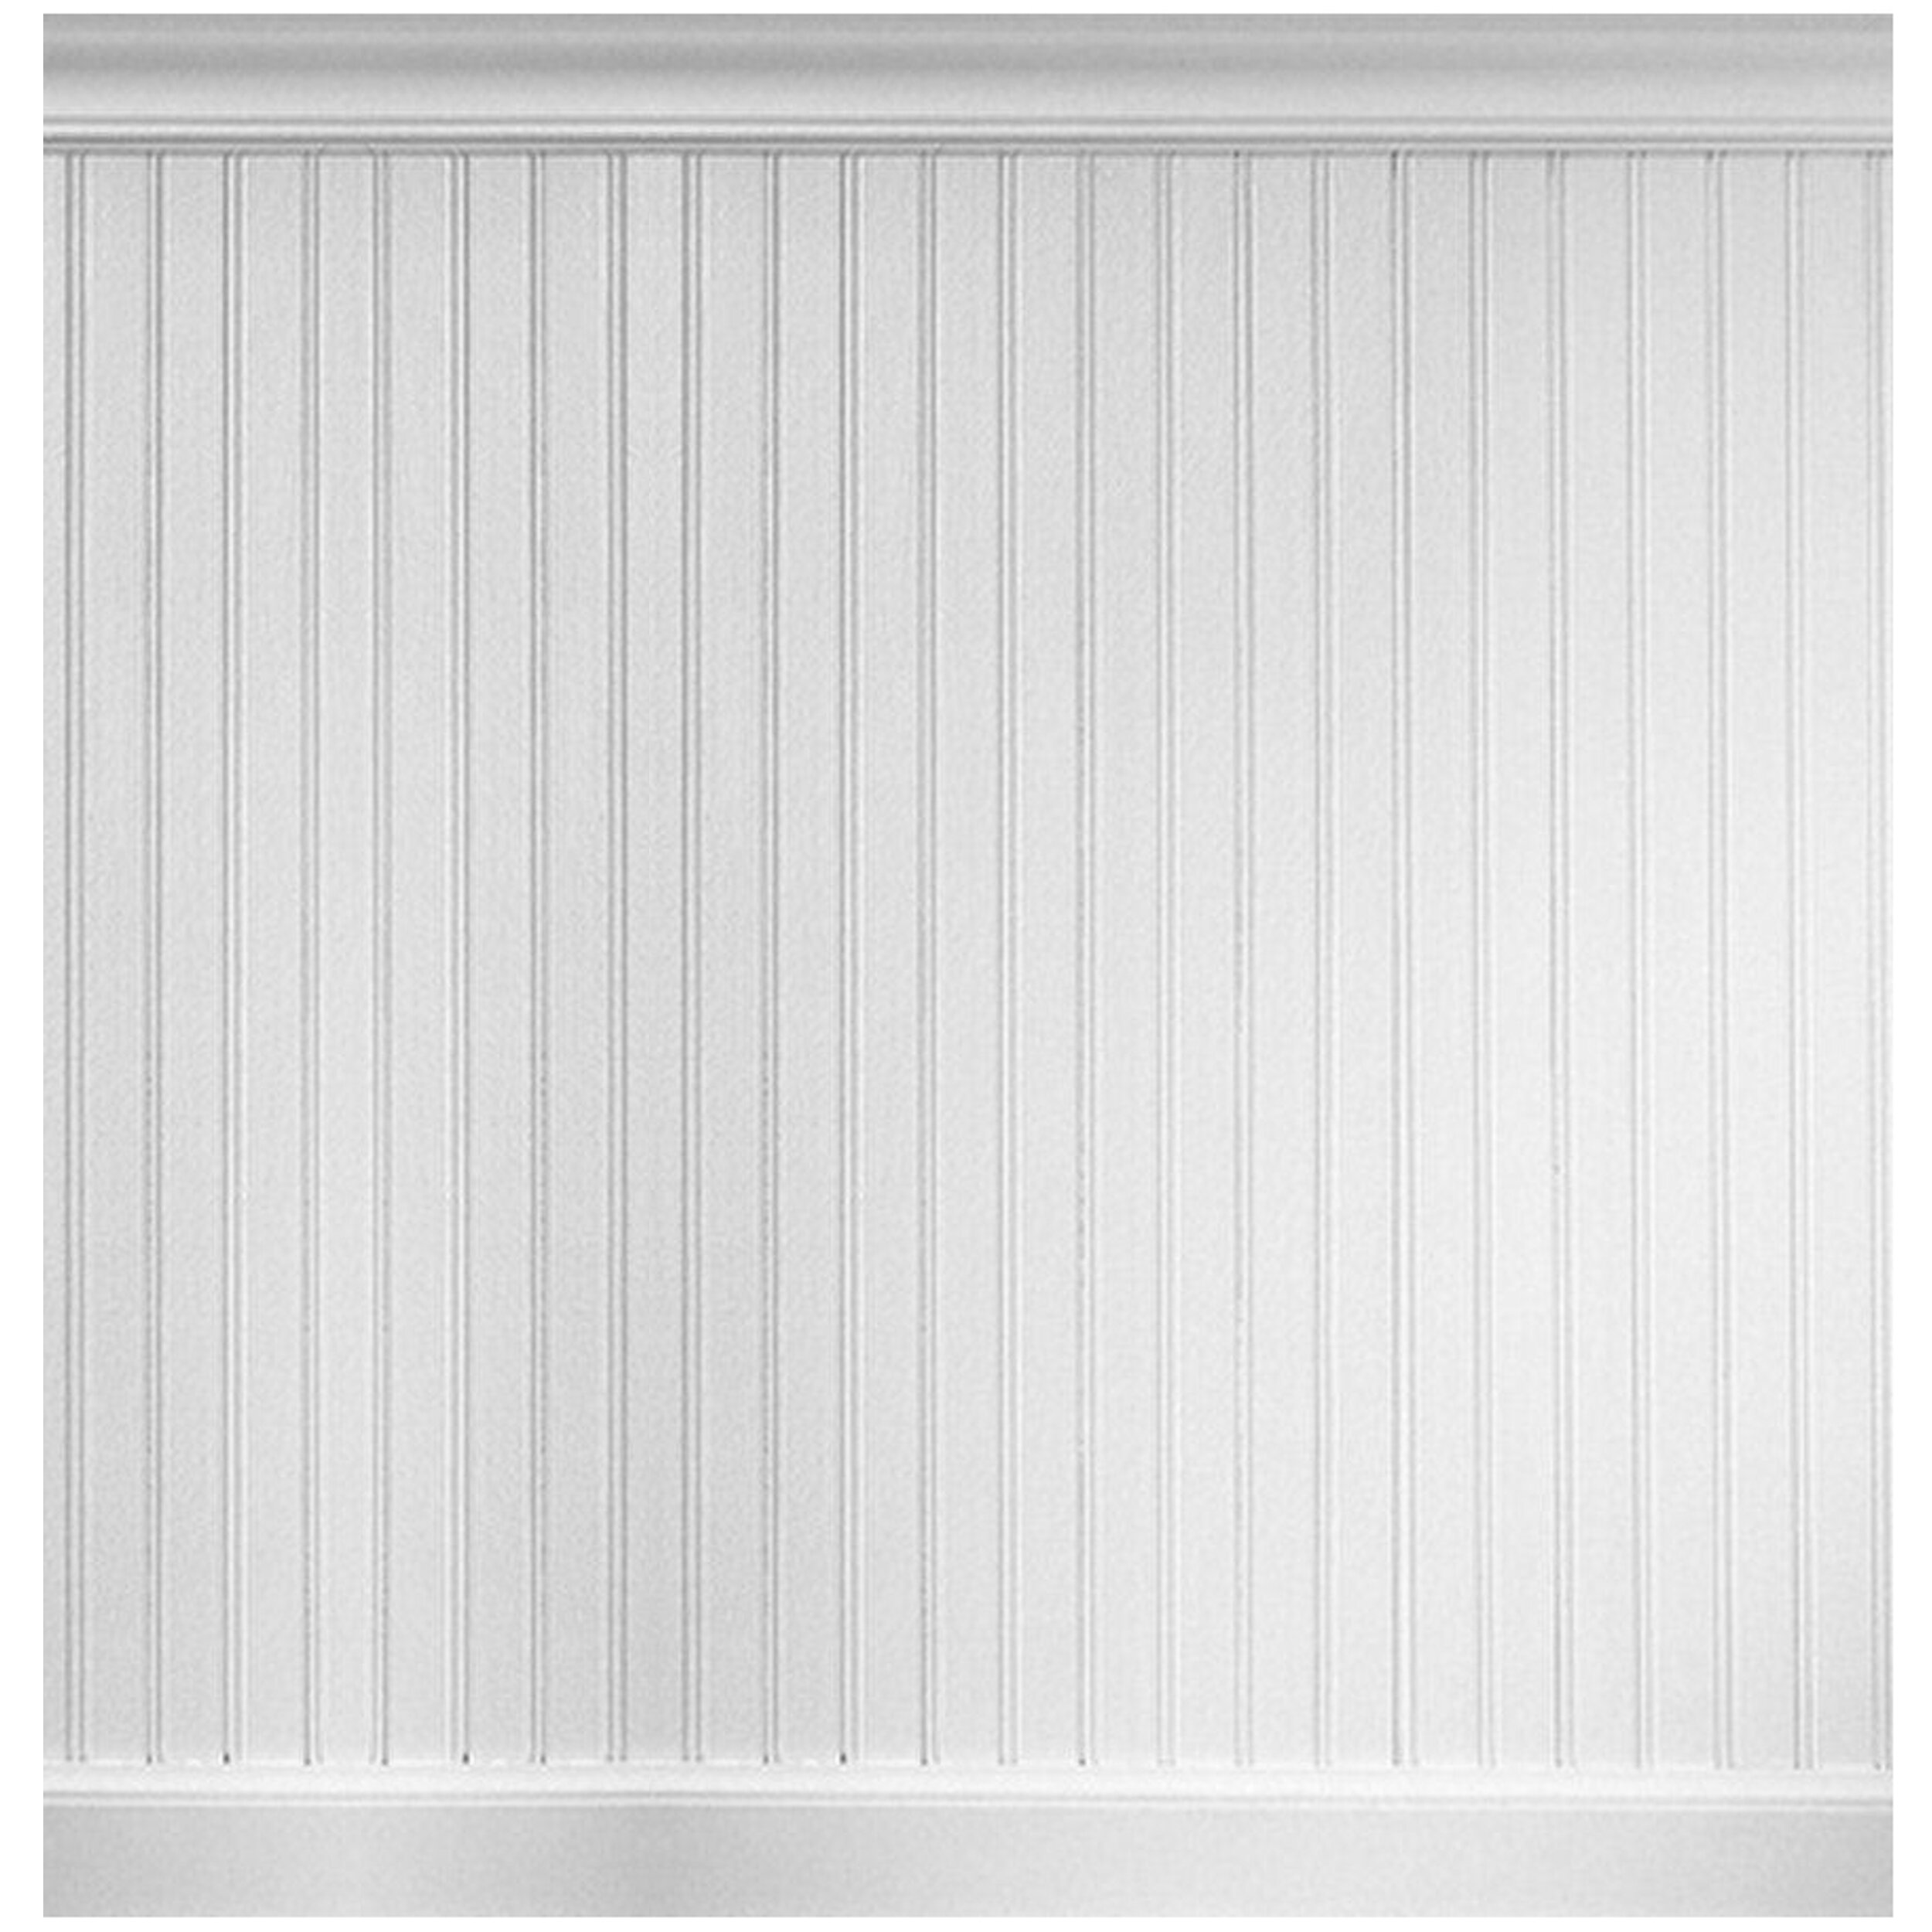 8 linear ft mdf overlapping wainscot paneling kit wayfair. Black Bedroom Furniture Sets. Home Design Ideas